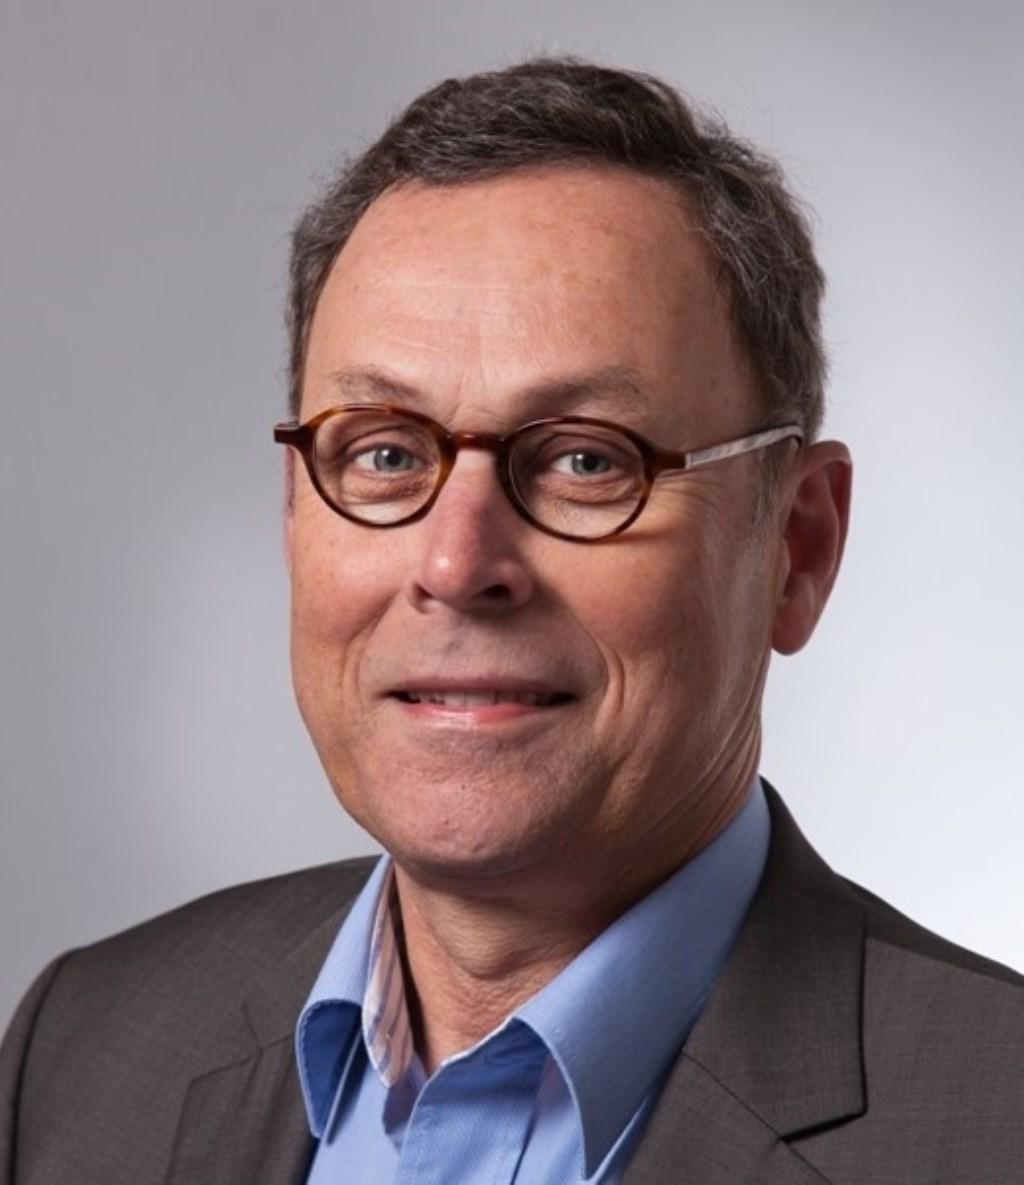 Raadslid Ben Stoelinga (Amersfoort2014). Annemoon van Hemel © BDU media